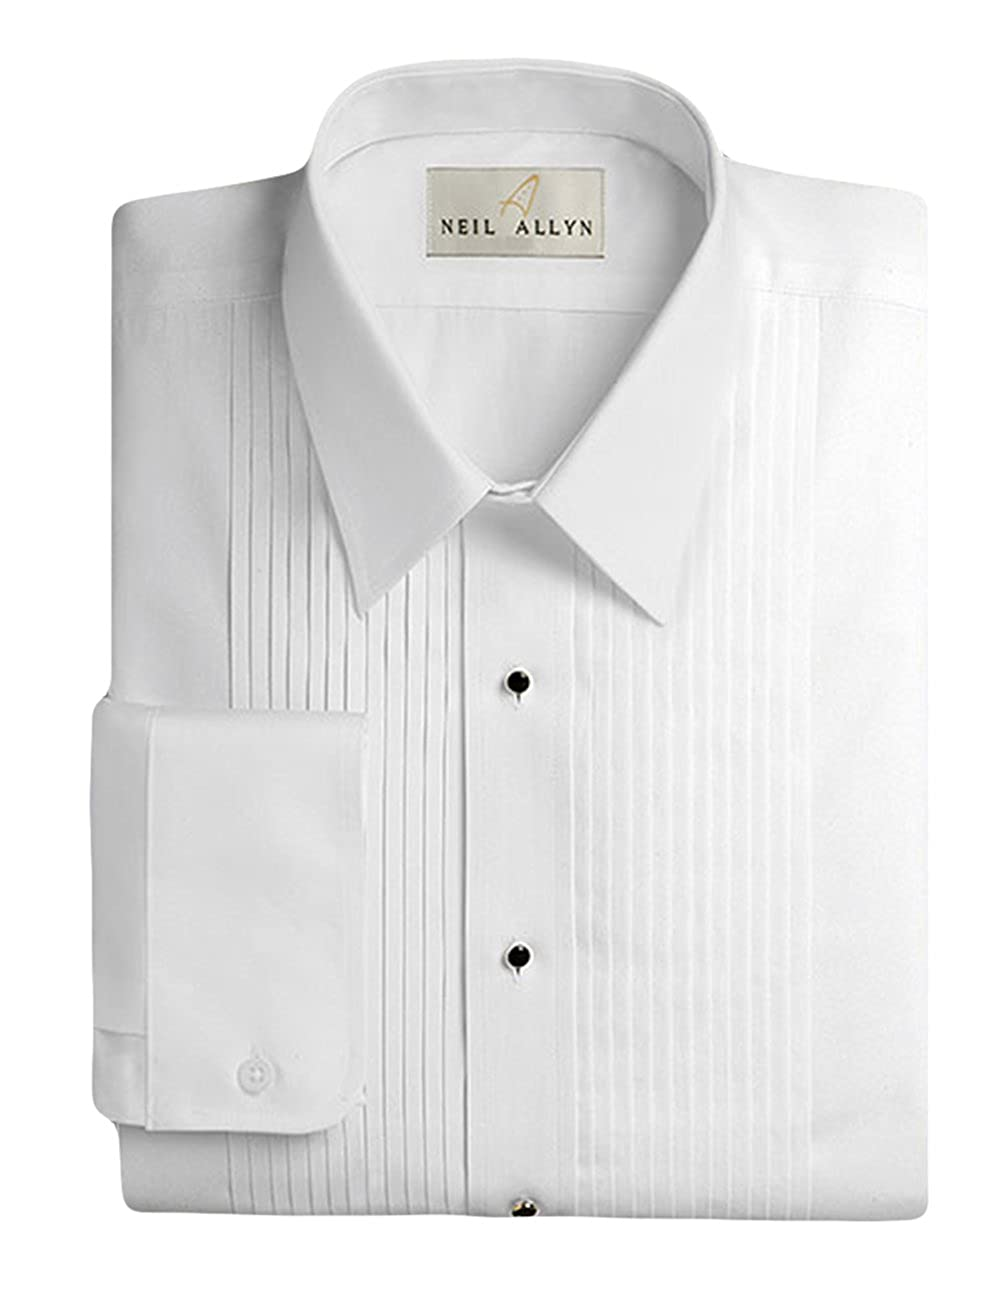 "Neil Allyn Men's Tuxedo Shirt 100% Cotton 1/4"" Pleat Laydown Collar"